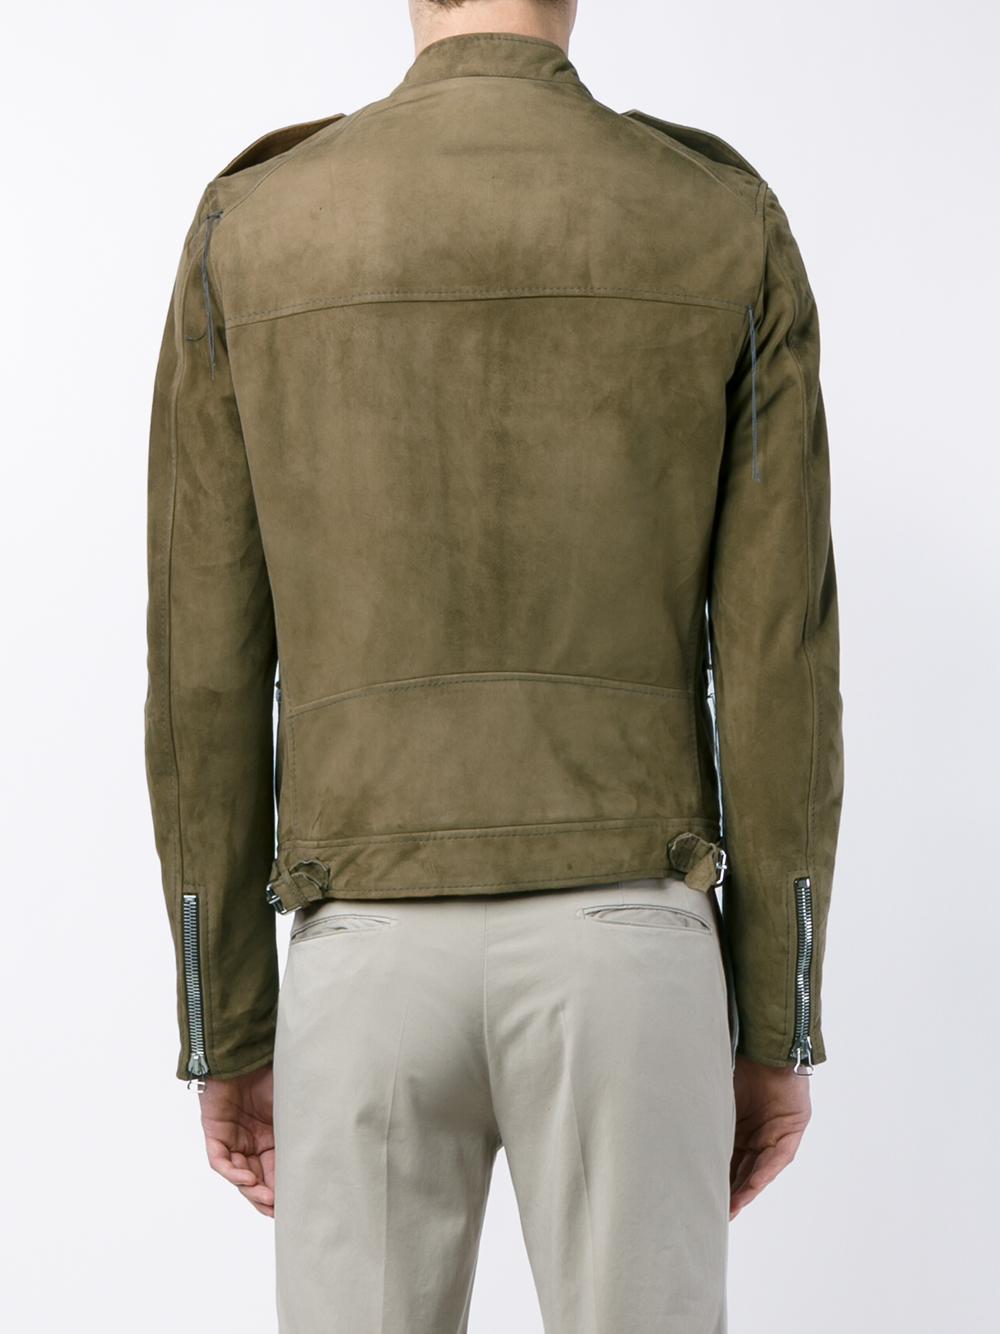 Lanvin Suede Jacket in Tan (Green) for Men